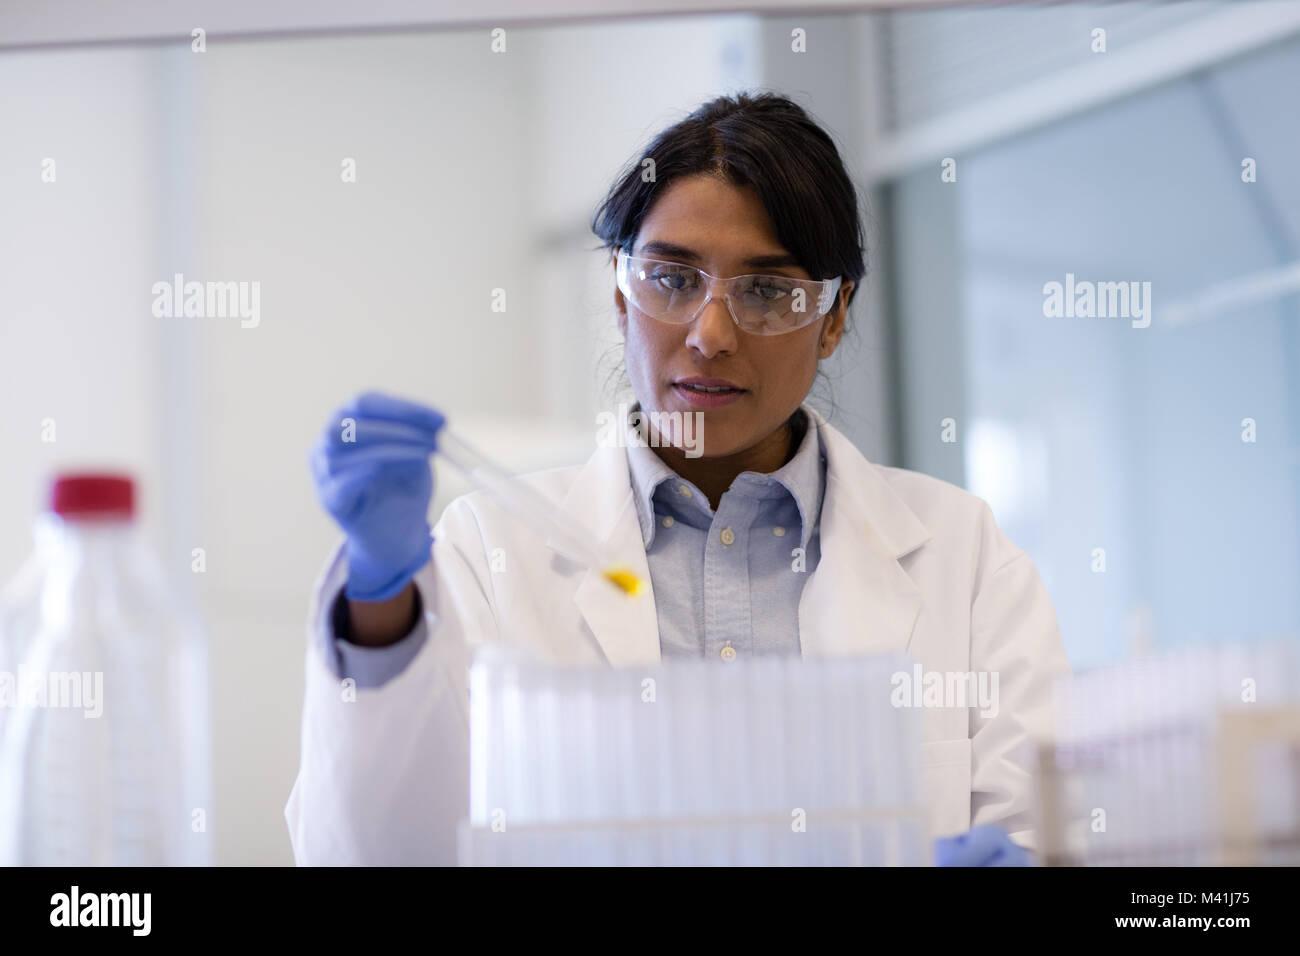 Female scientist analyzing test tube échantillon Photo Stock